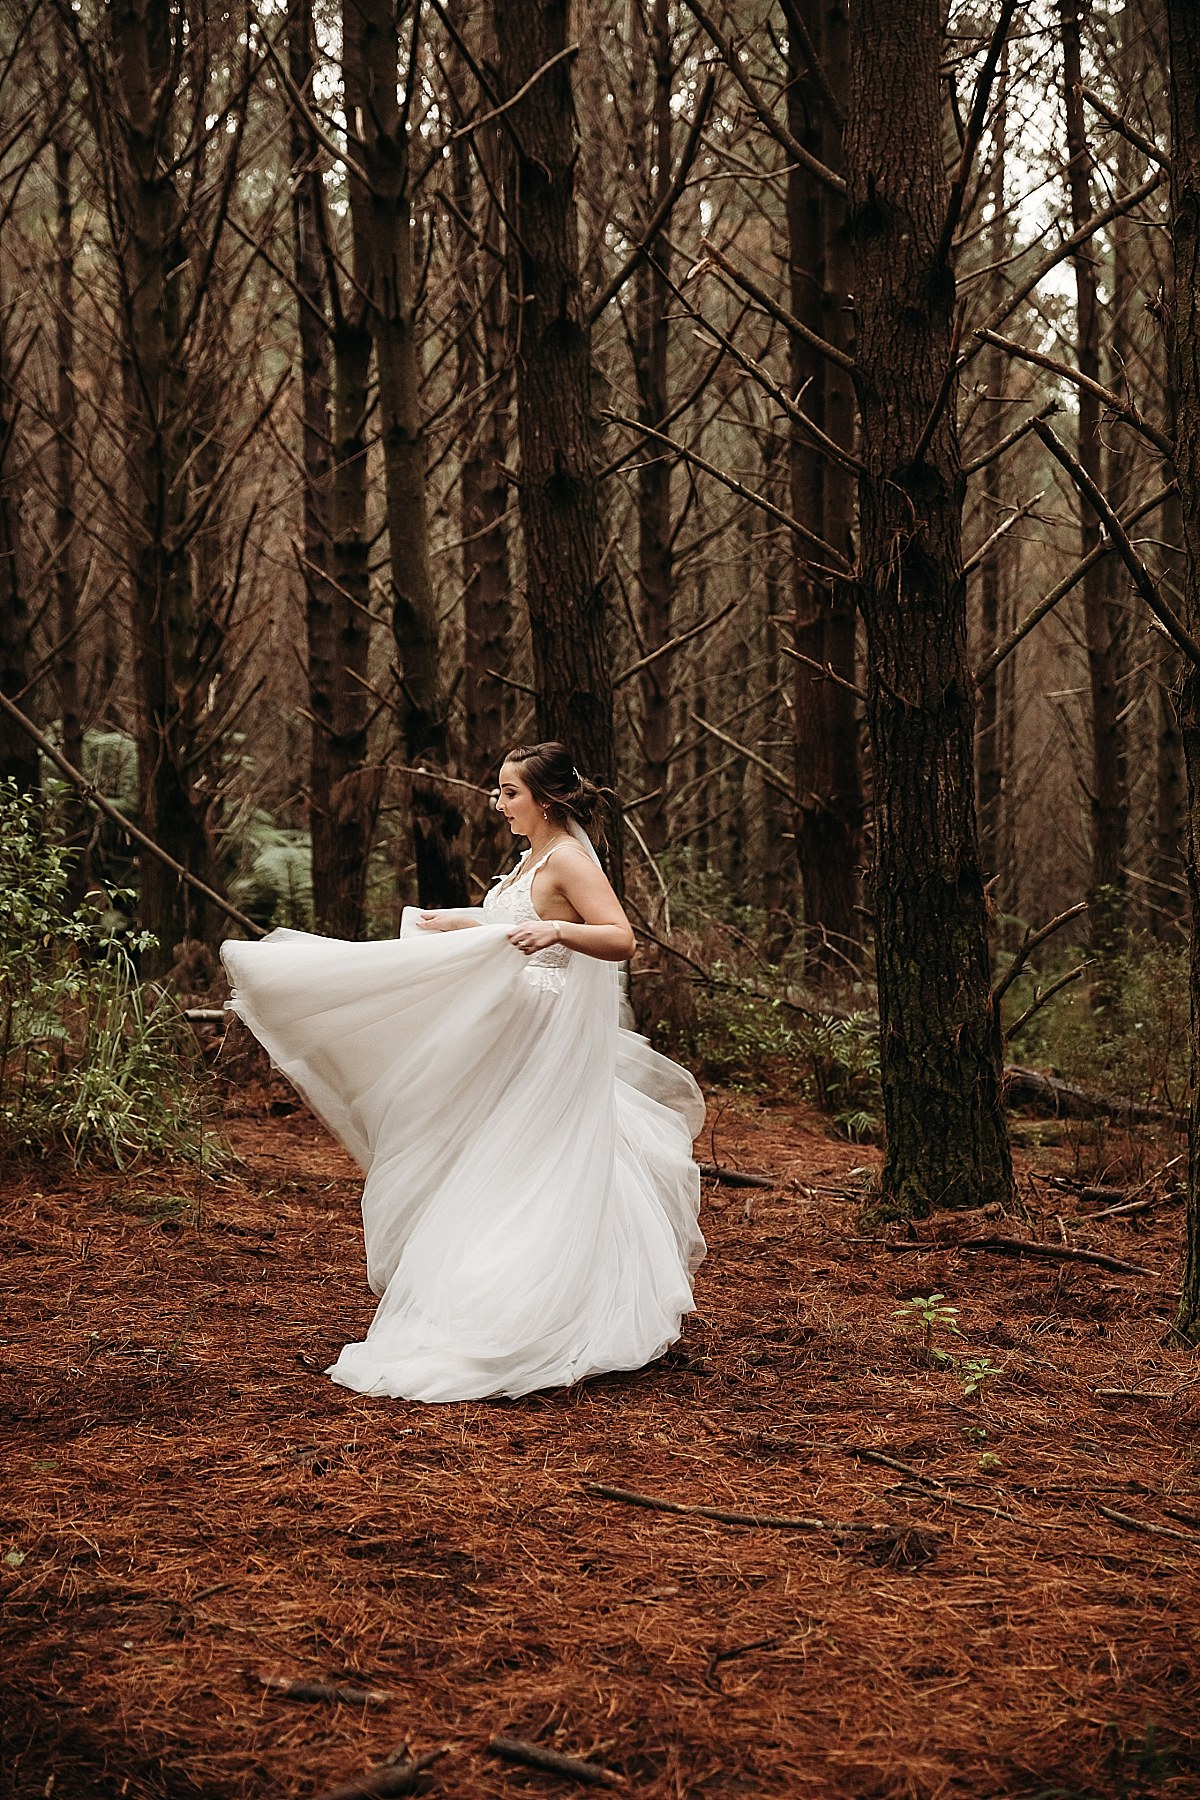 Queenstown Wedding Couple - Auckland Wedding Photographer_0149.jpg